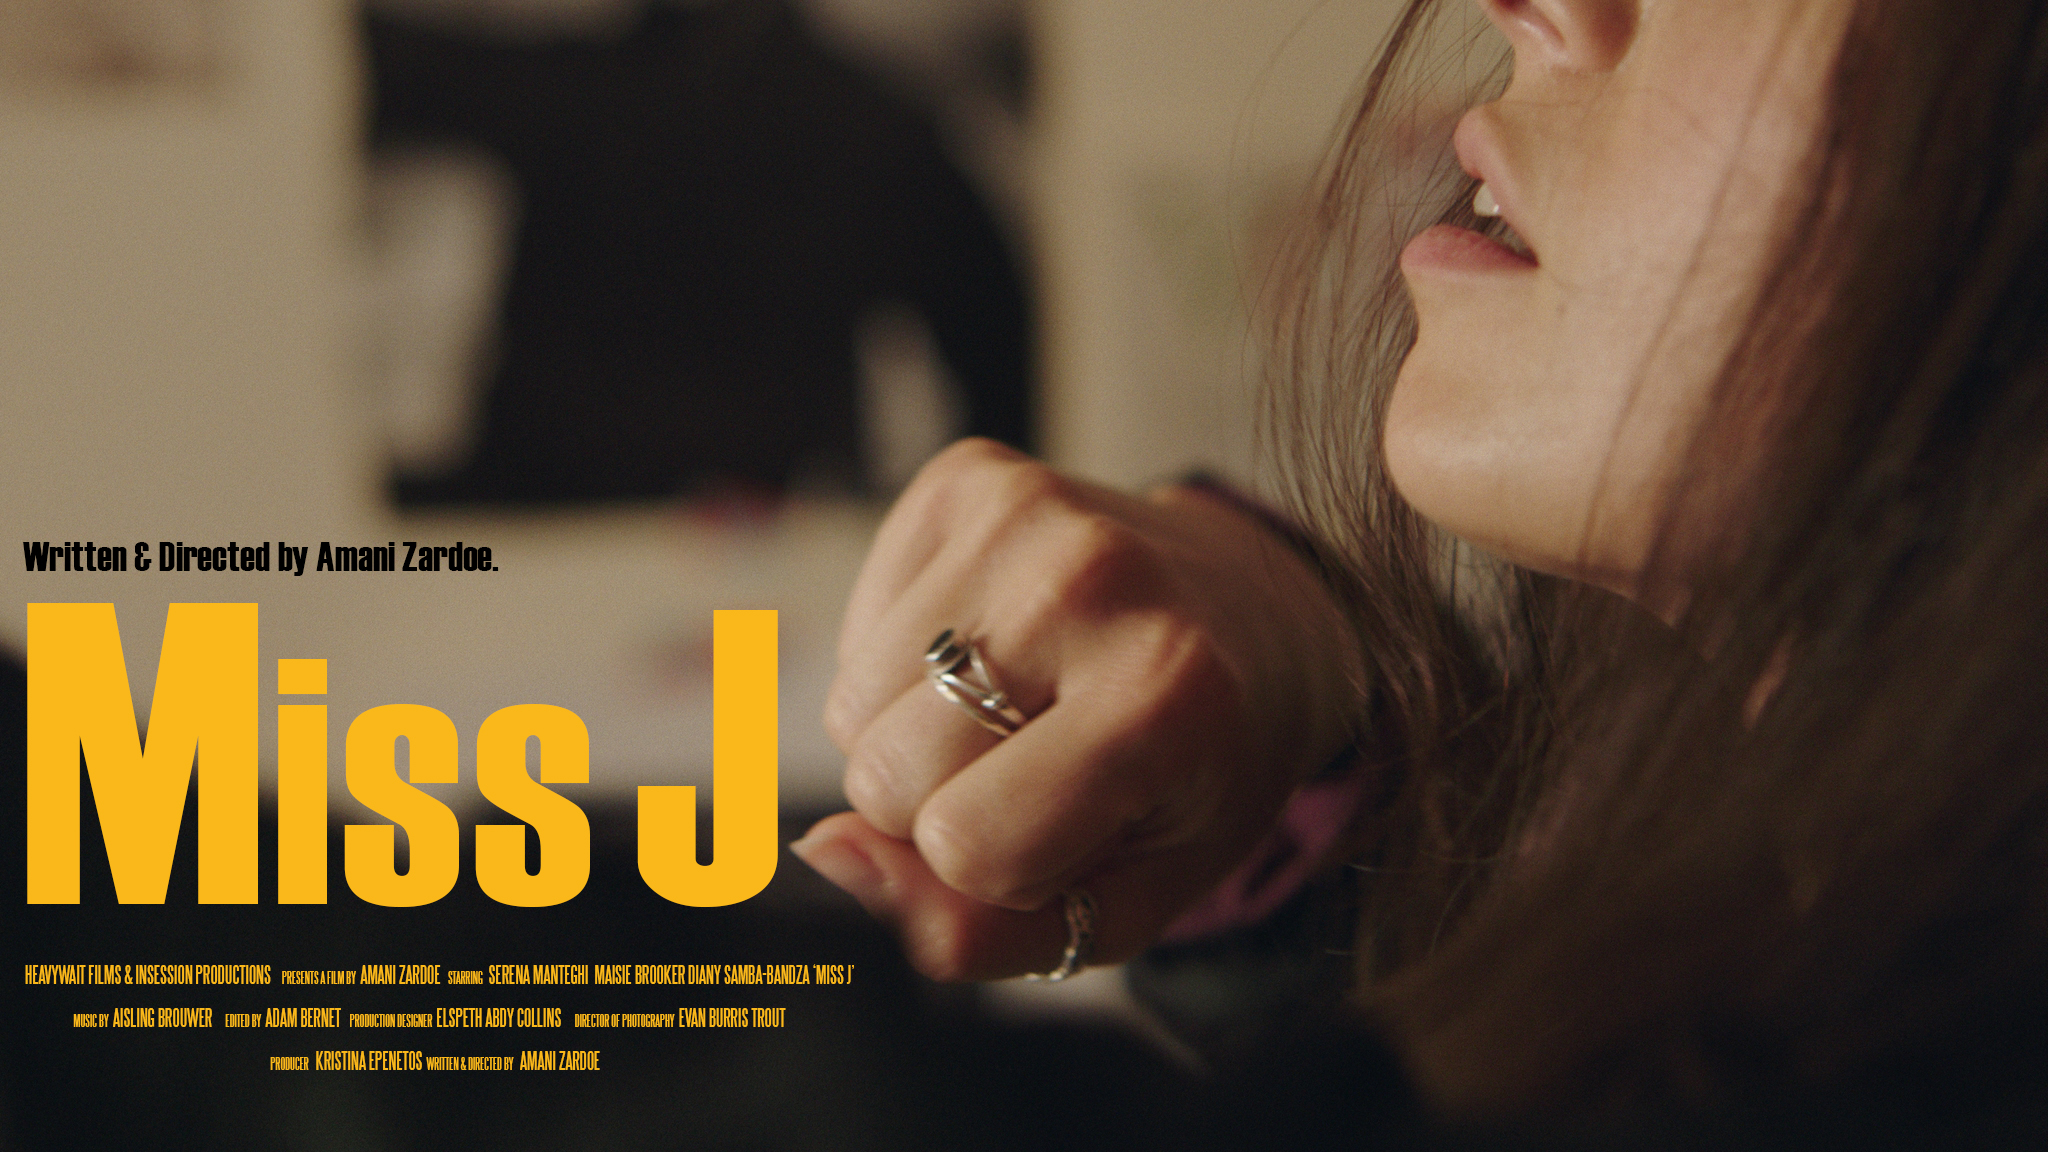 Miss_J_1.jpg